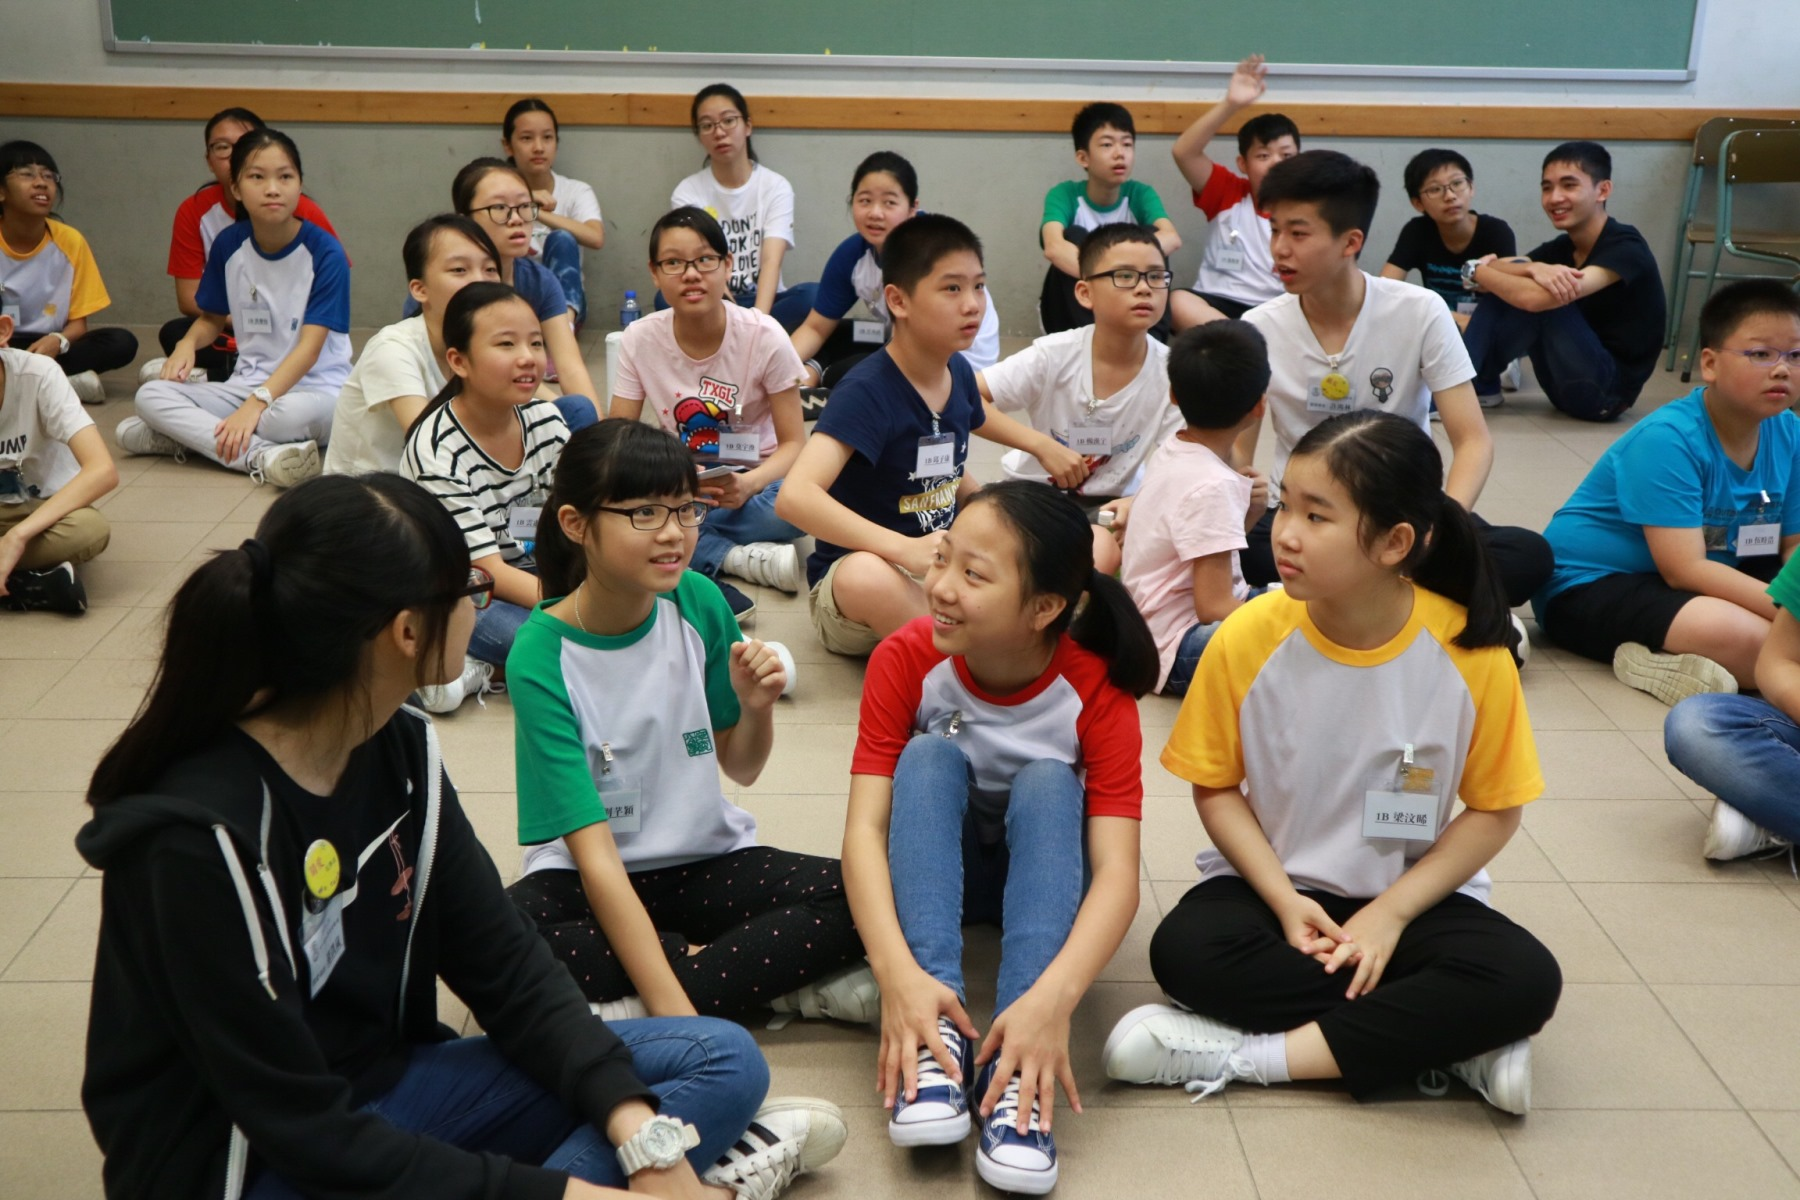 https://www.npc.edu.hk/sites/default/files/1b_dong_dong_nao_05.jpg